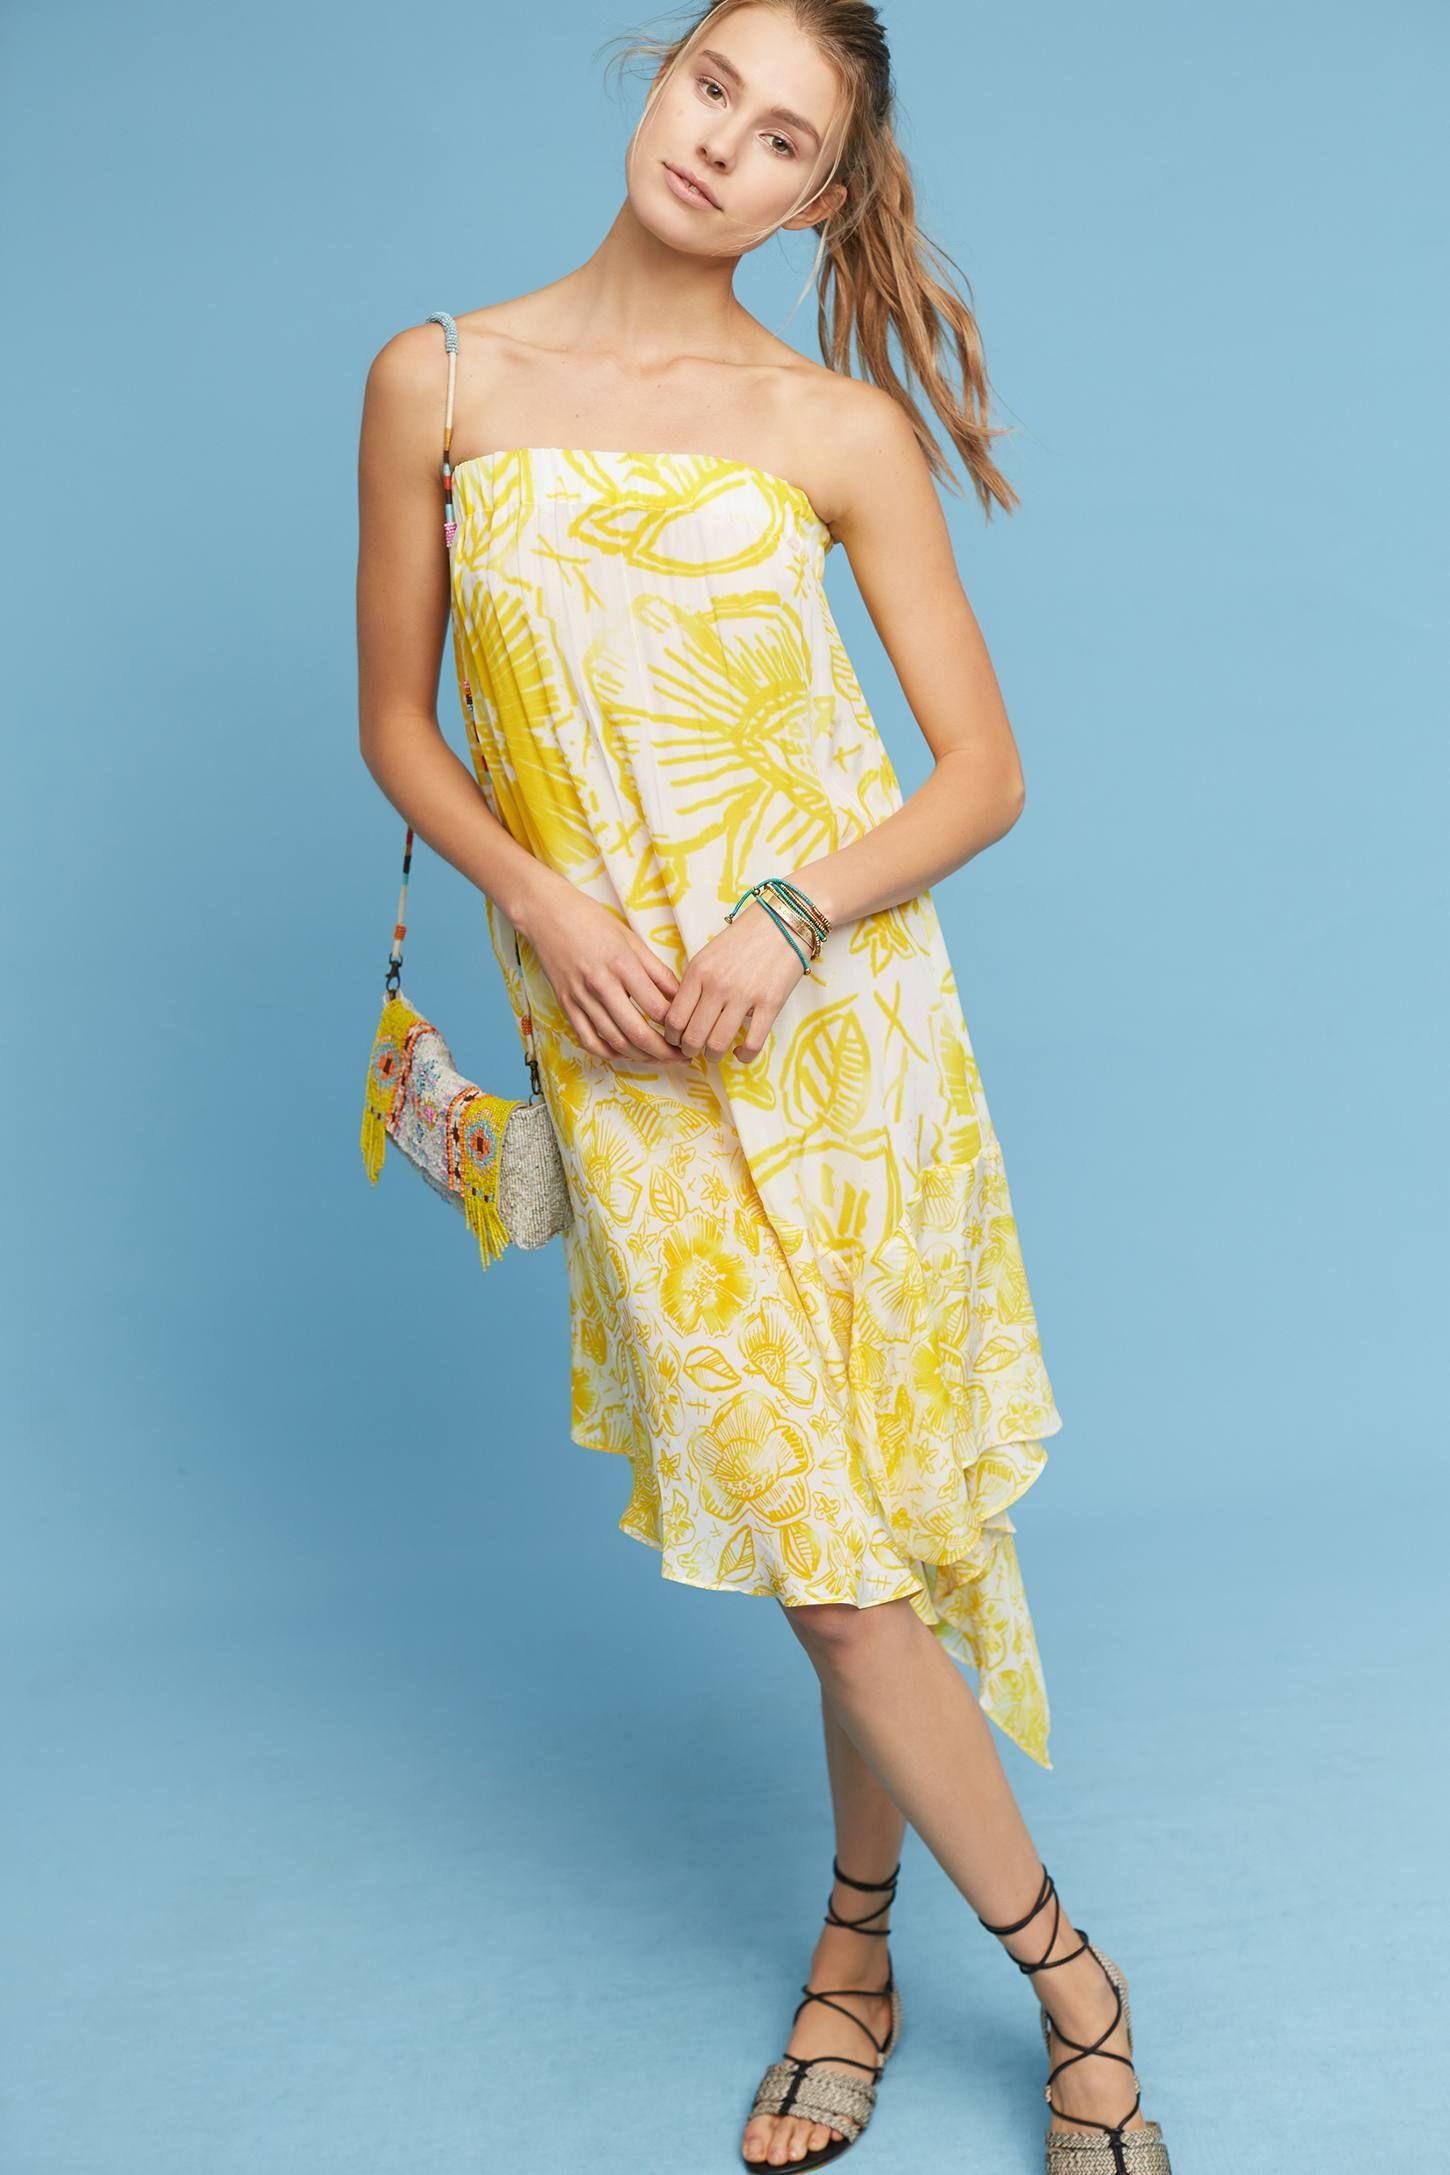 Malibu Strapless Dress | Style | Dresses, Strapless dress ...